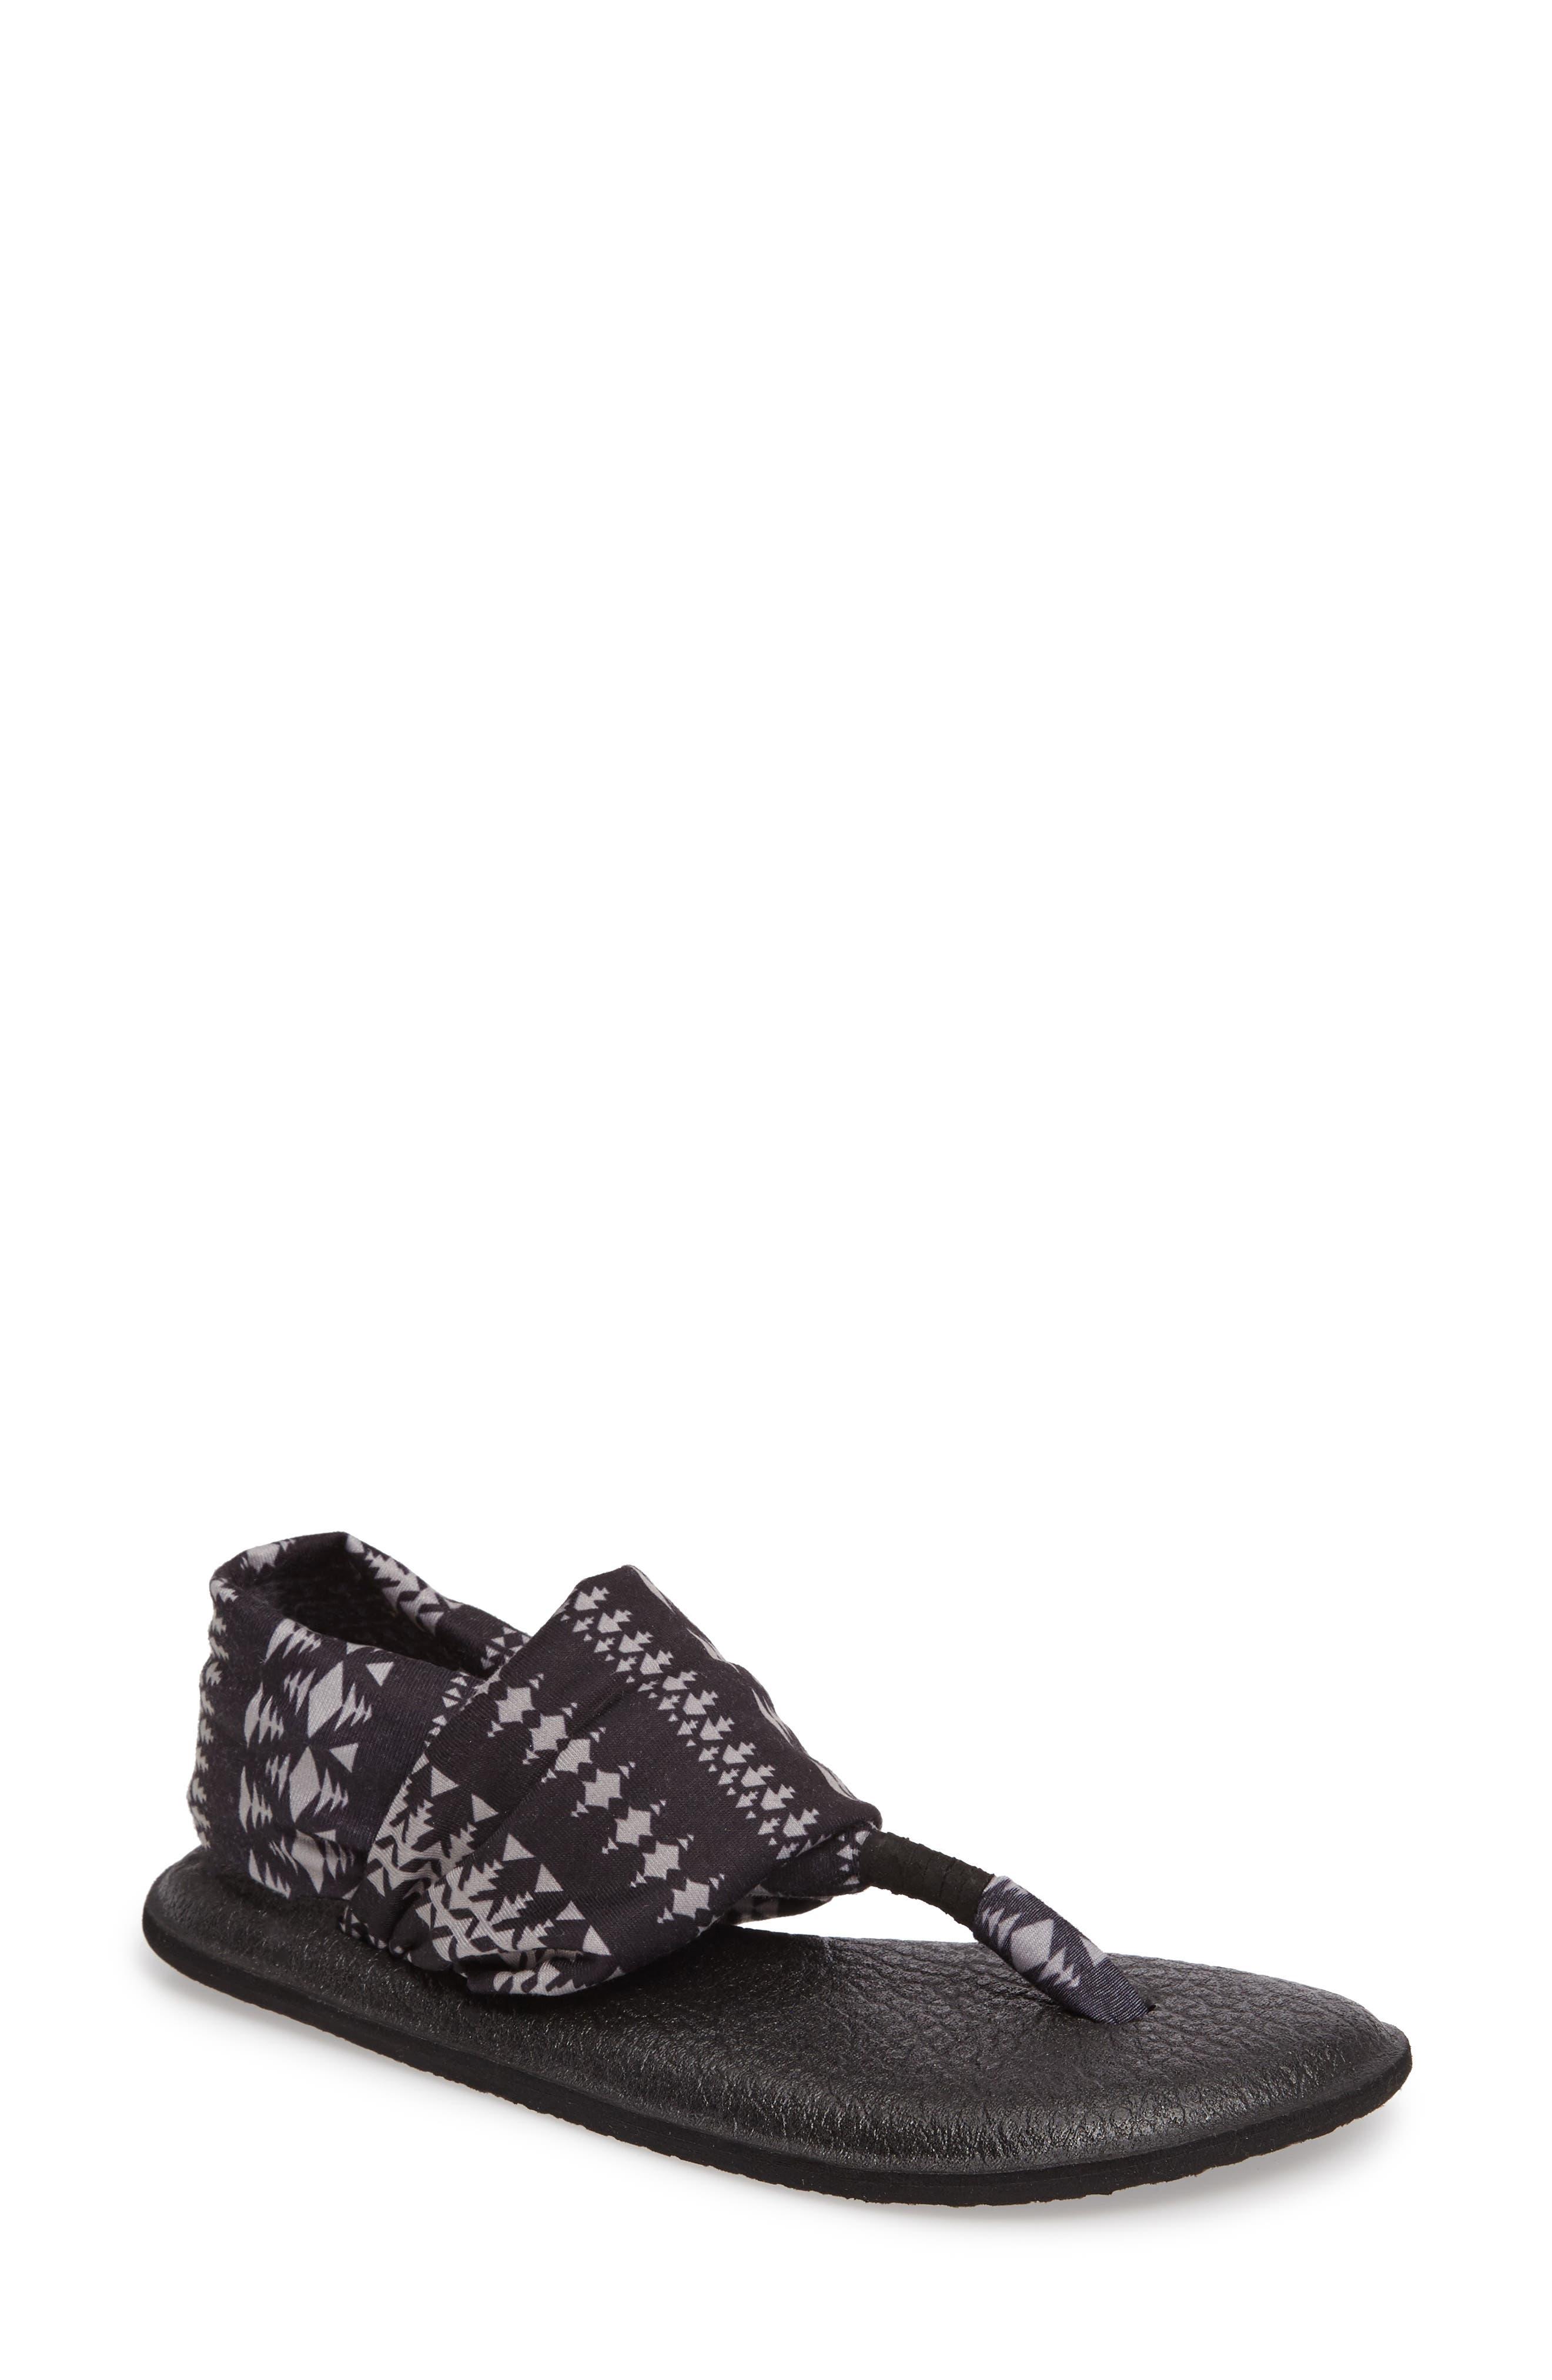 'Yoga Sling 2' Sandal,                         Main,                         color, BLACK TRIBAL